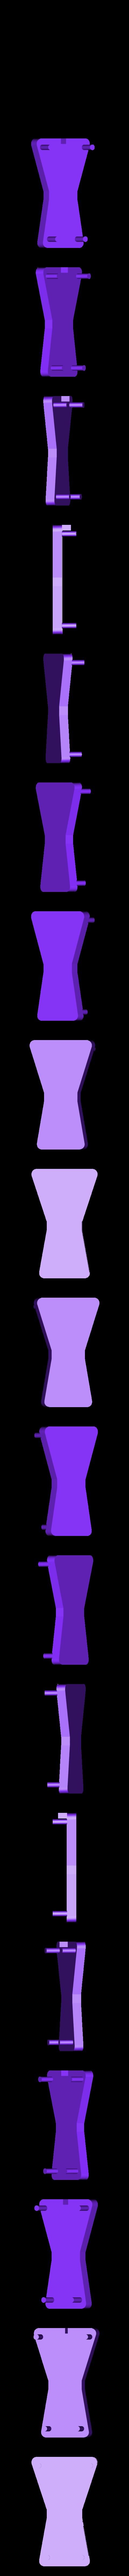 Ornament_Body_Back.STL Download free STL file Pull-String Nutcracker Ornament • 3D printer template, Girthnath